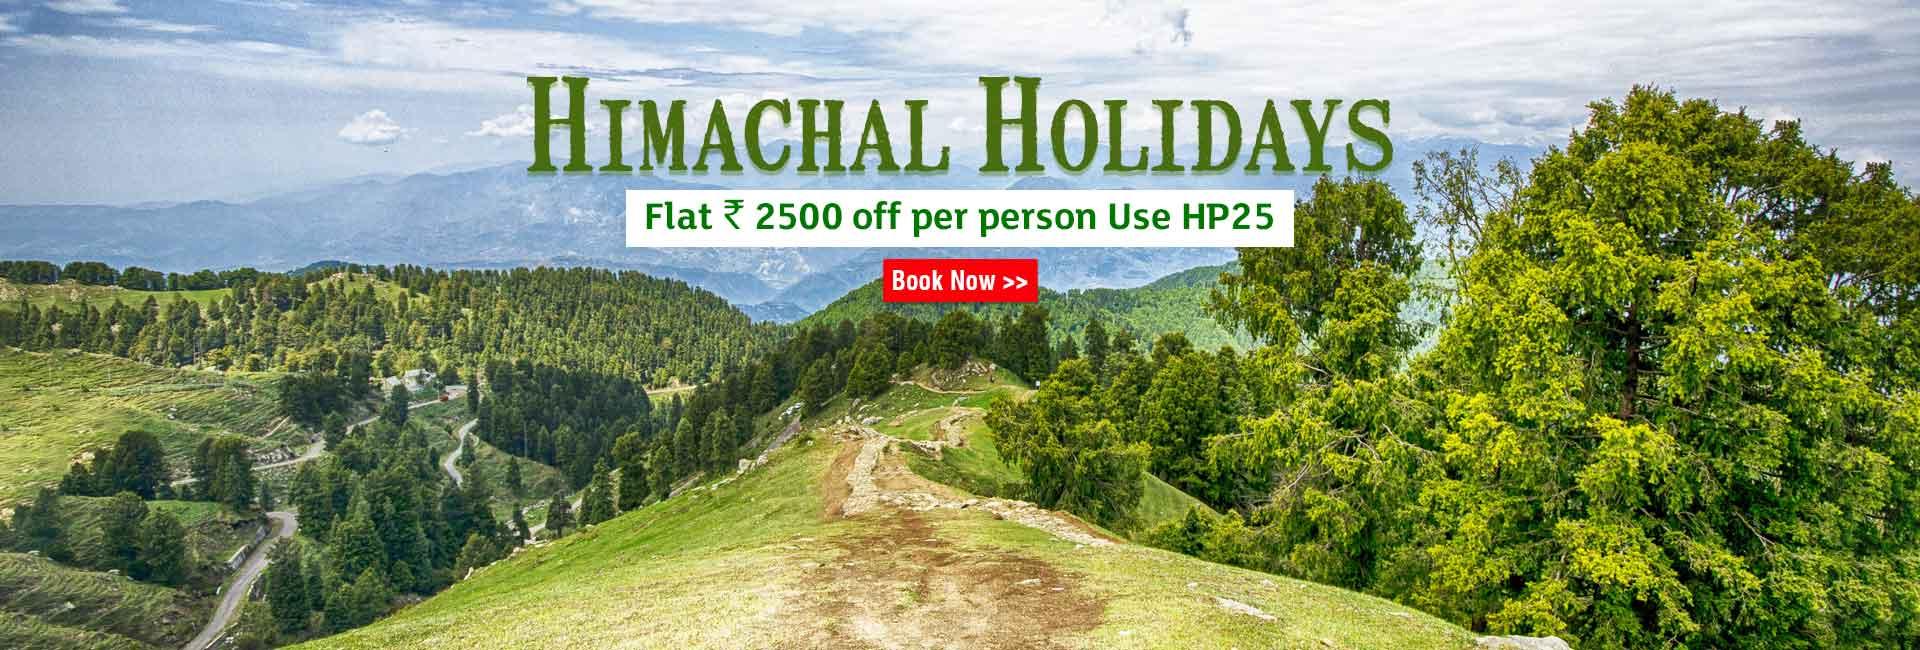 Himachal Pradesh Holidays